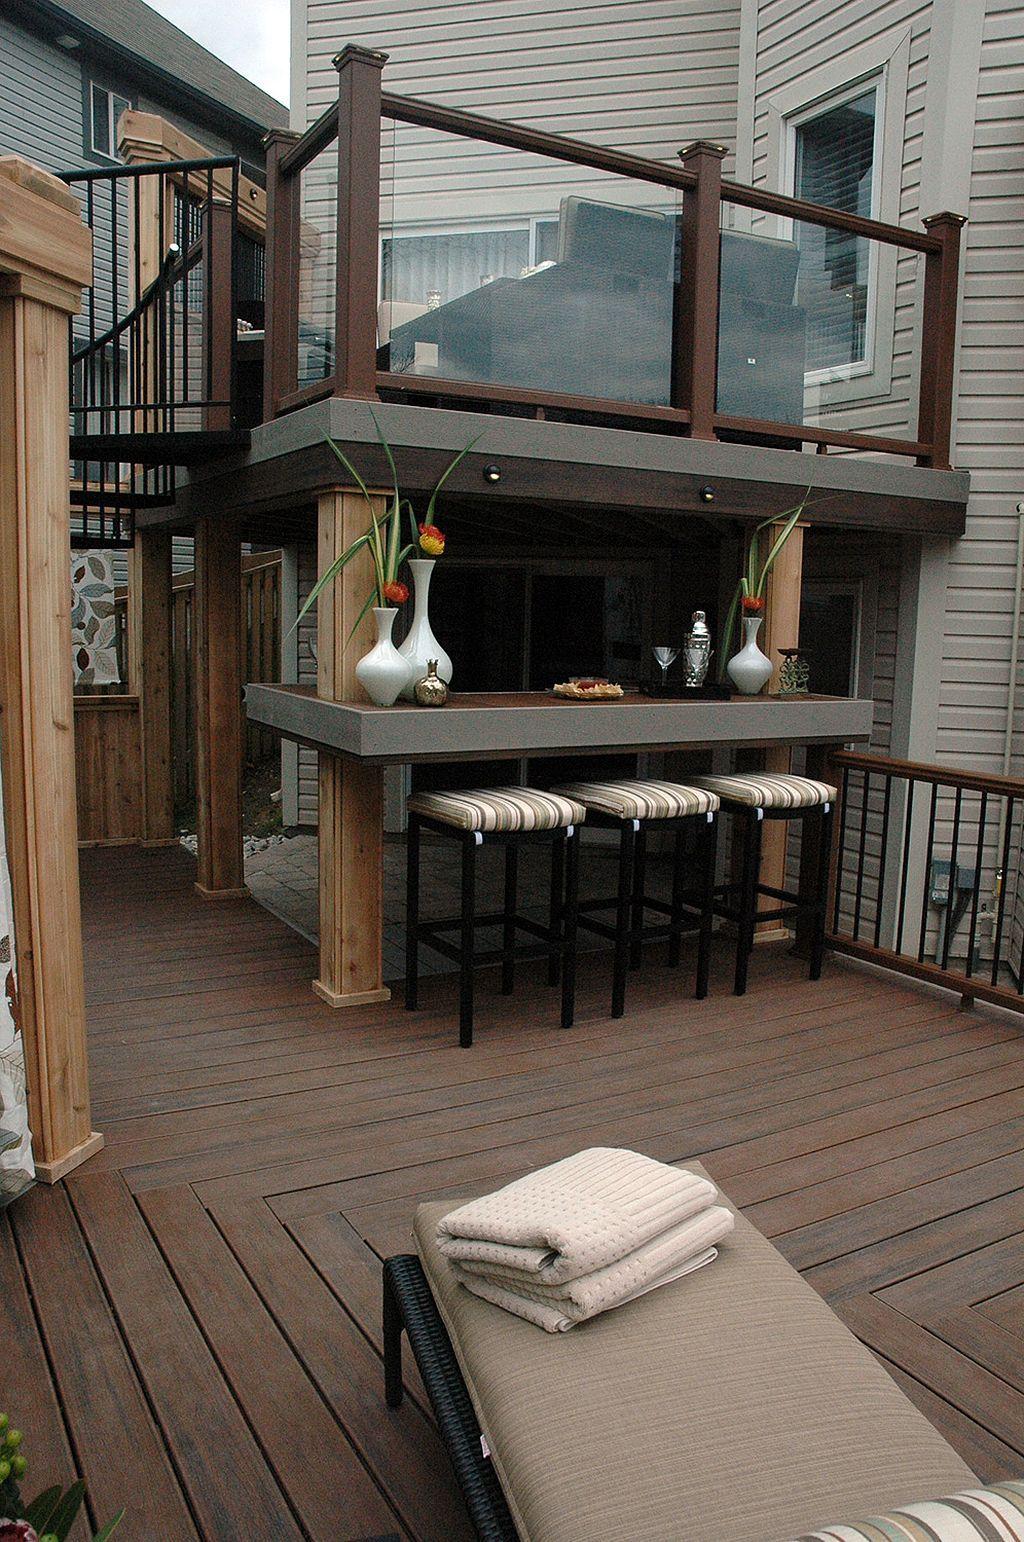 Stunning 40 Second Floor Deck Ideas To